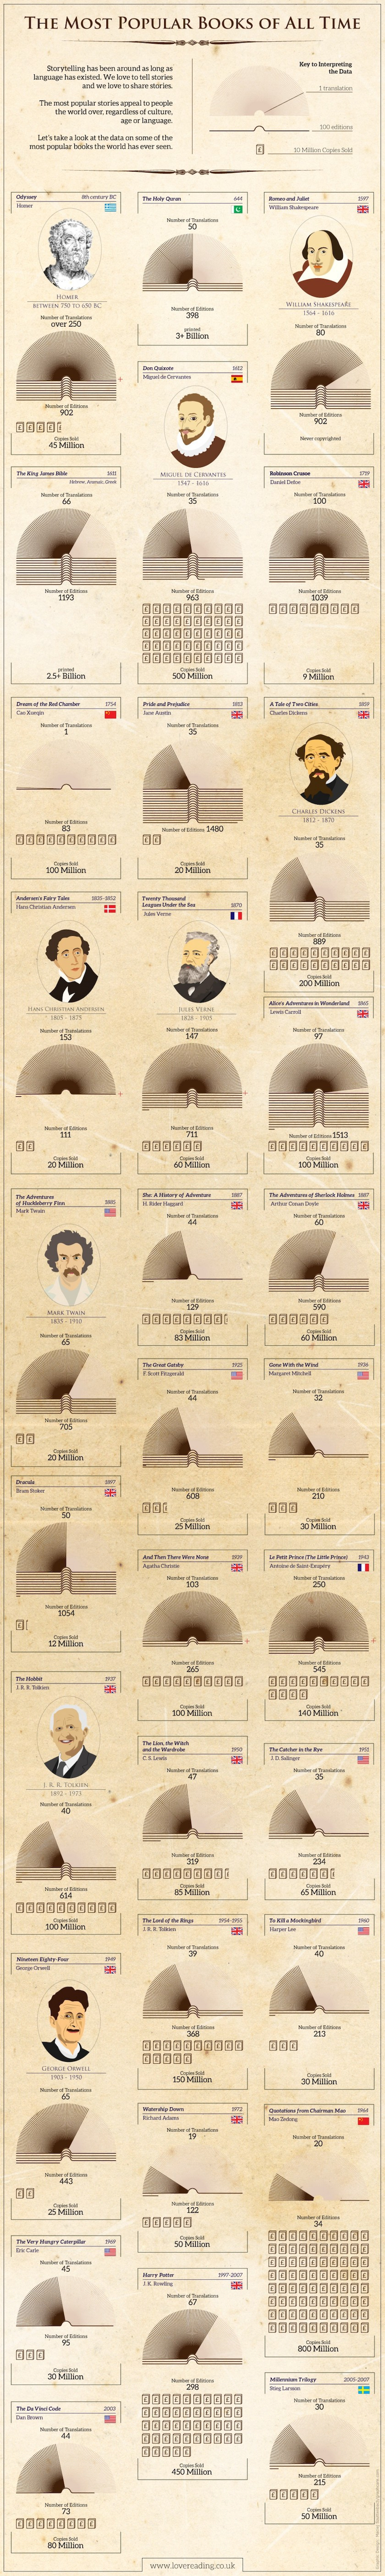 infographic popular books